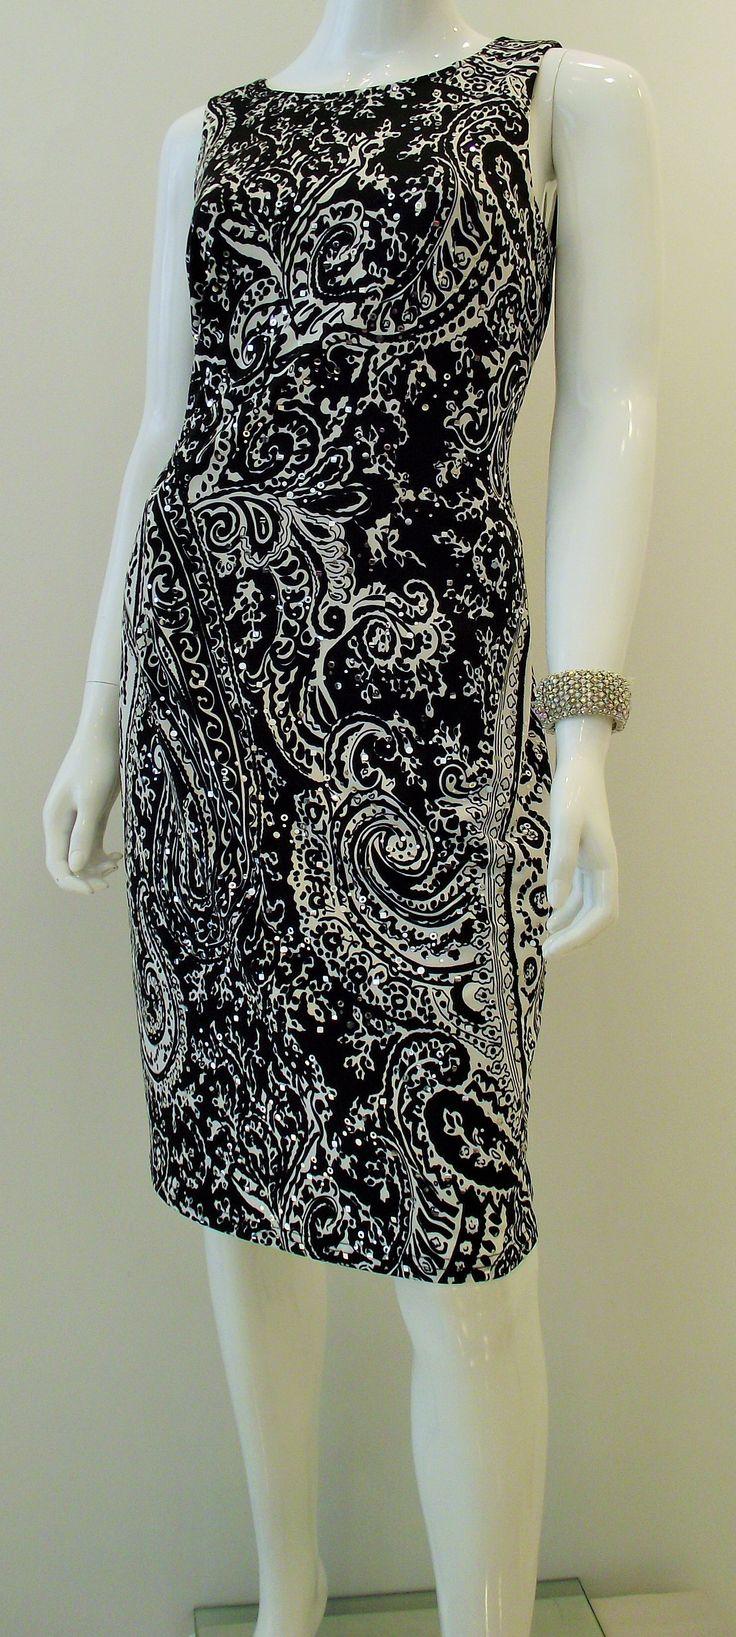 little black dress with a fun paisley twist! #classicboutique #eastgwillimbury #pickeringtowncenter #classic #Summerlovin